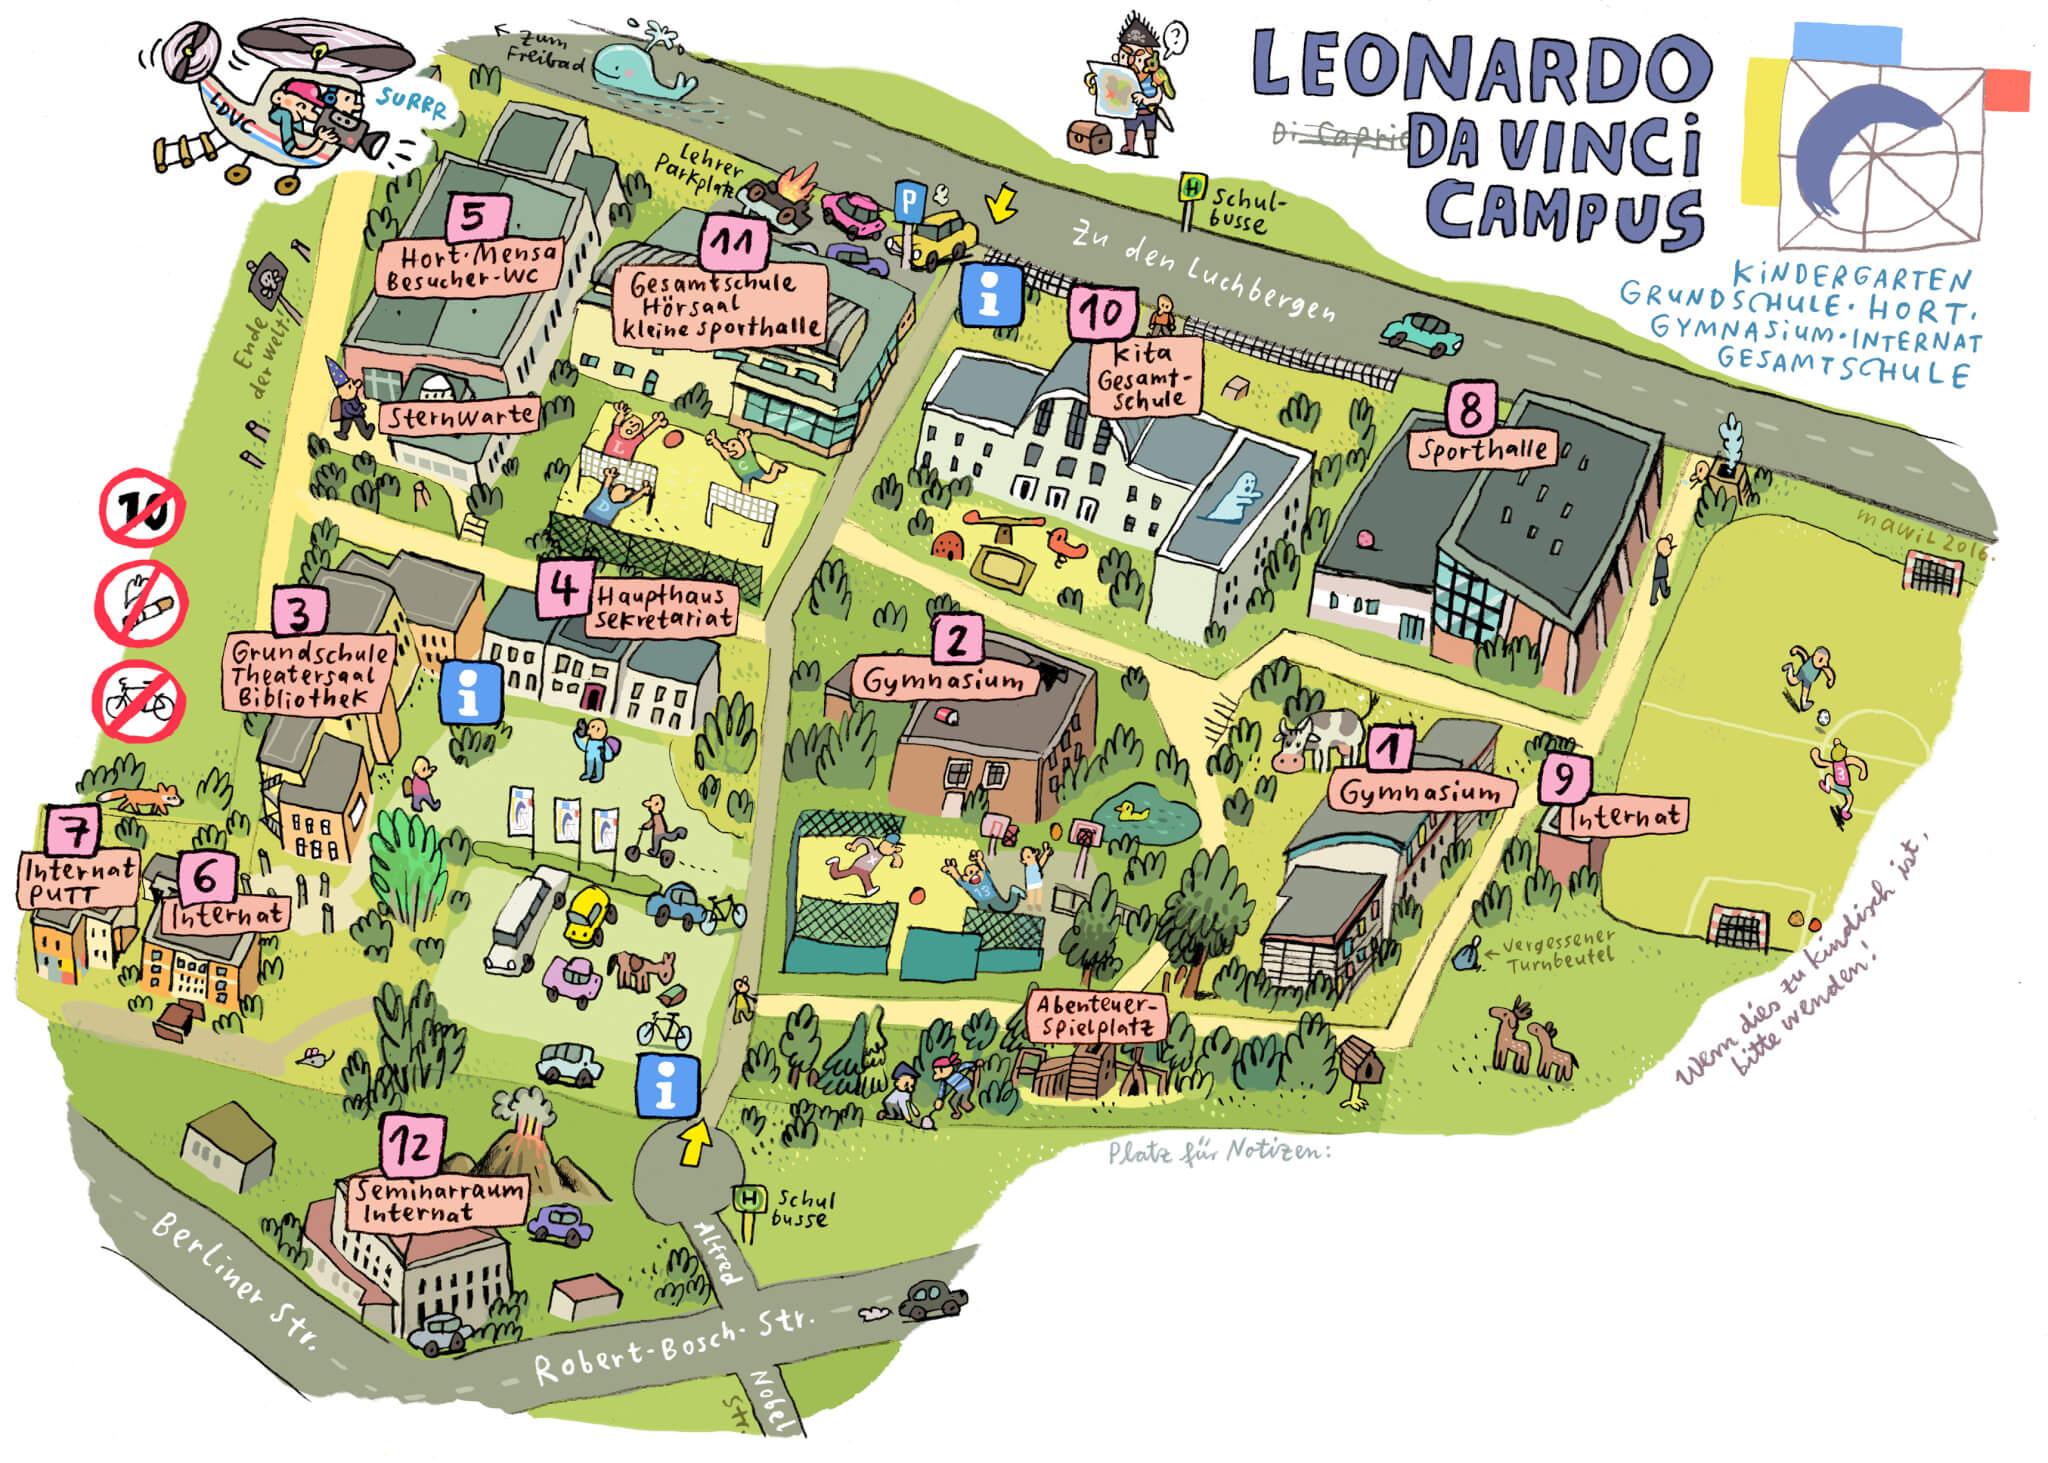 Interaktiver Campus Plan - Leonardo Da Vinci Campus on